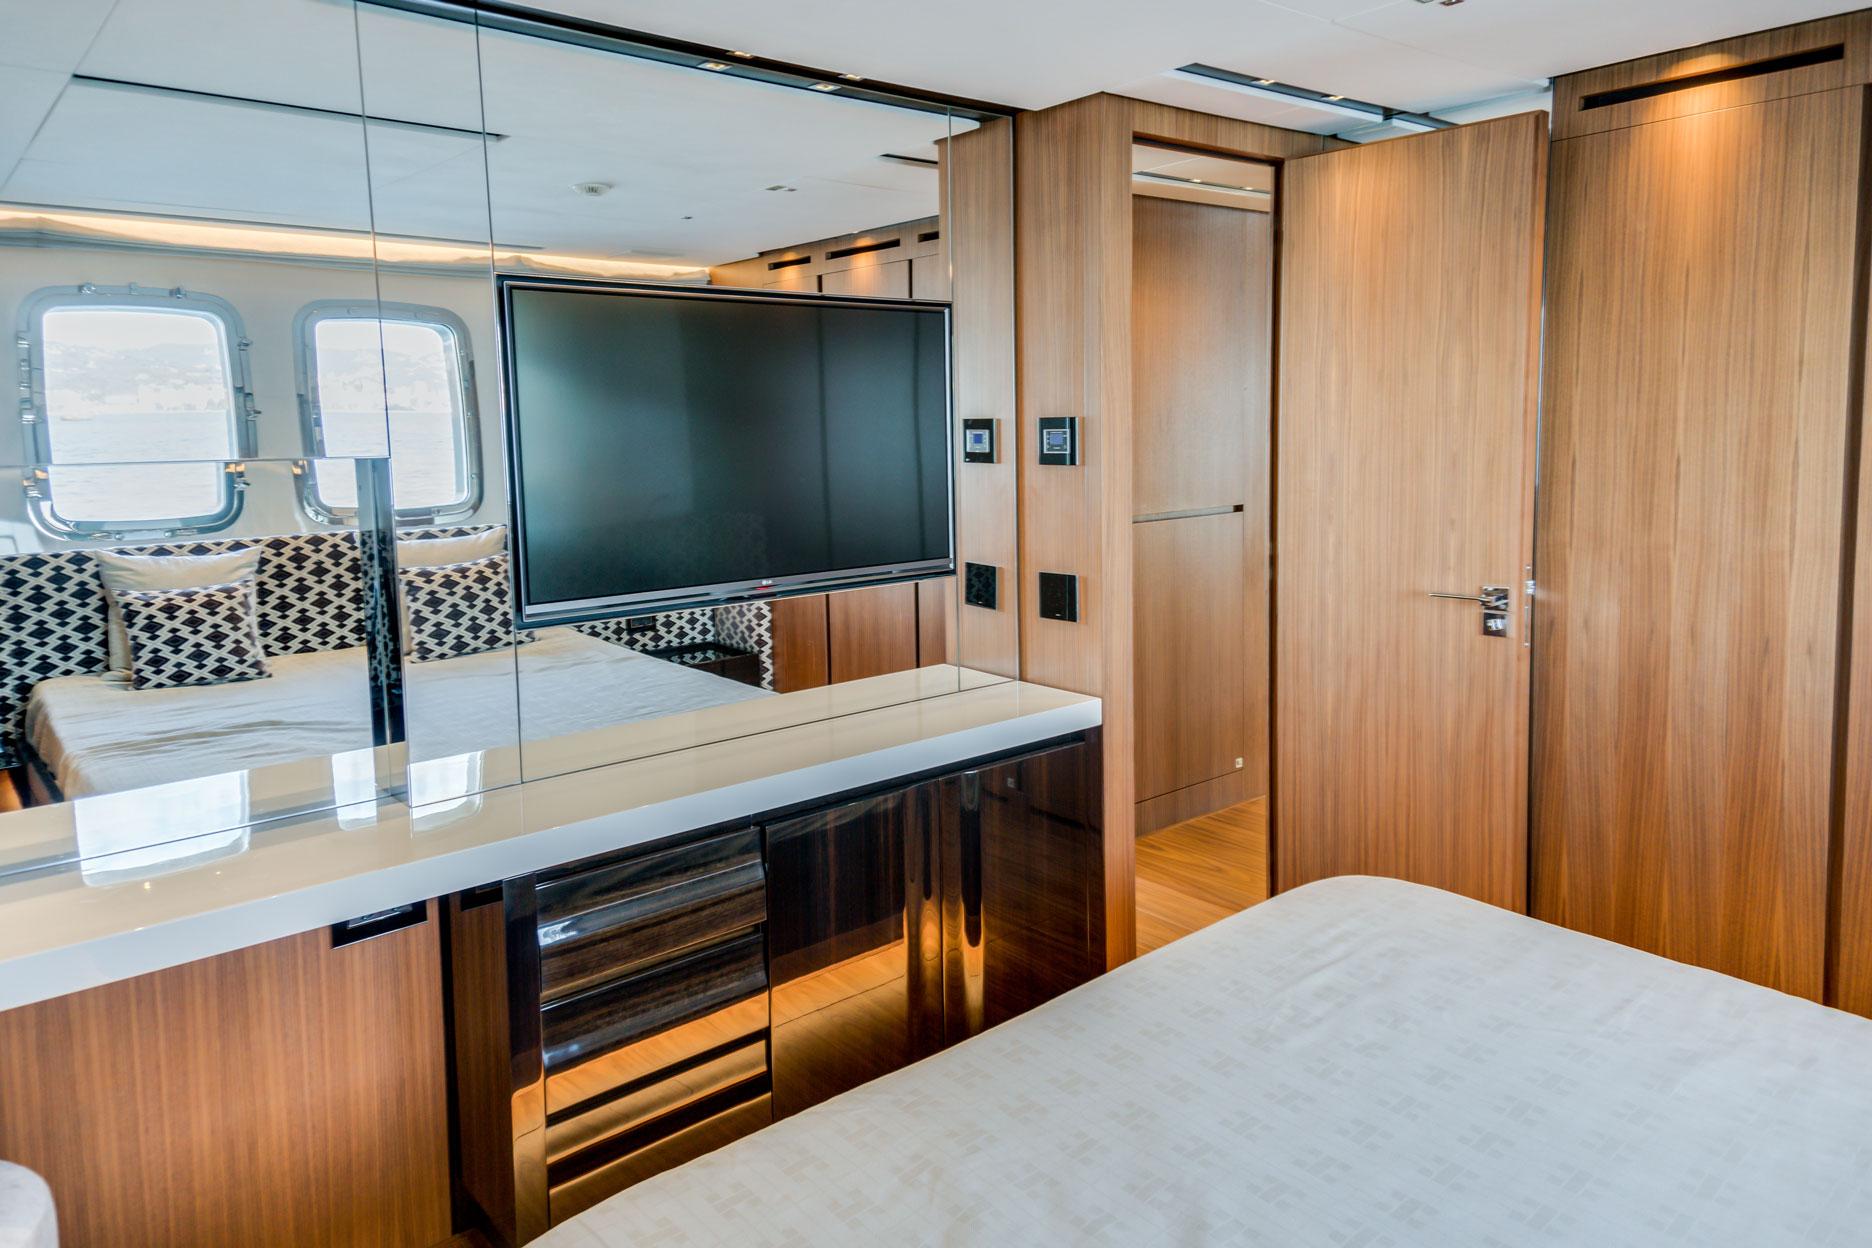 Sanlorenzo SL106 yacht for sale - Guest Cabin